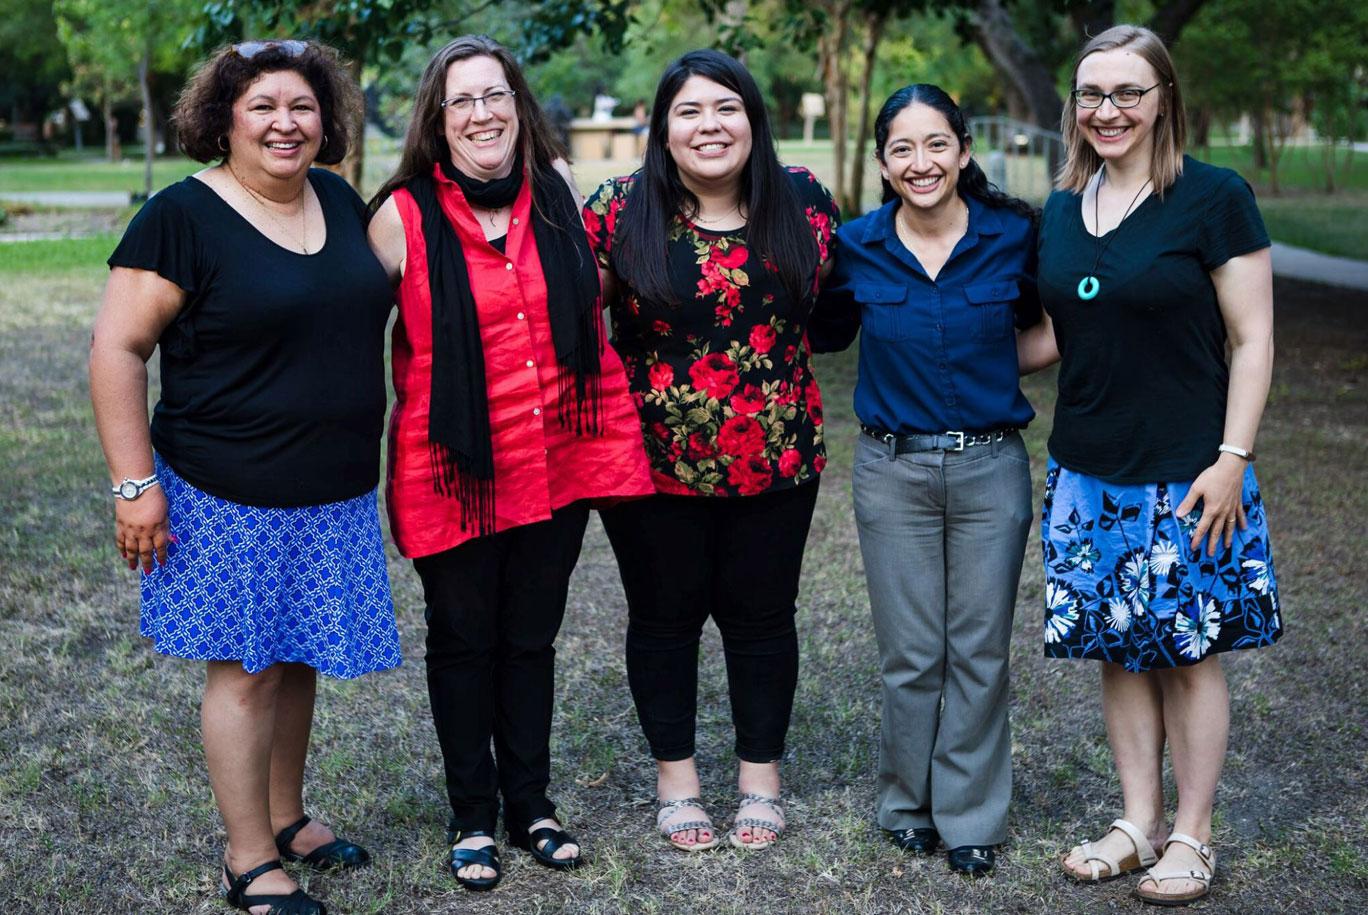 The curriculum team include Liz Ortiz, Dr. Ann David, Alejandra Herrera, Amanda Murillo and Rose Radkowski.